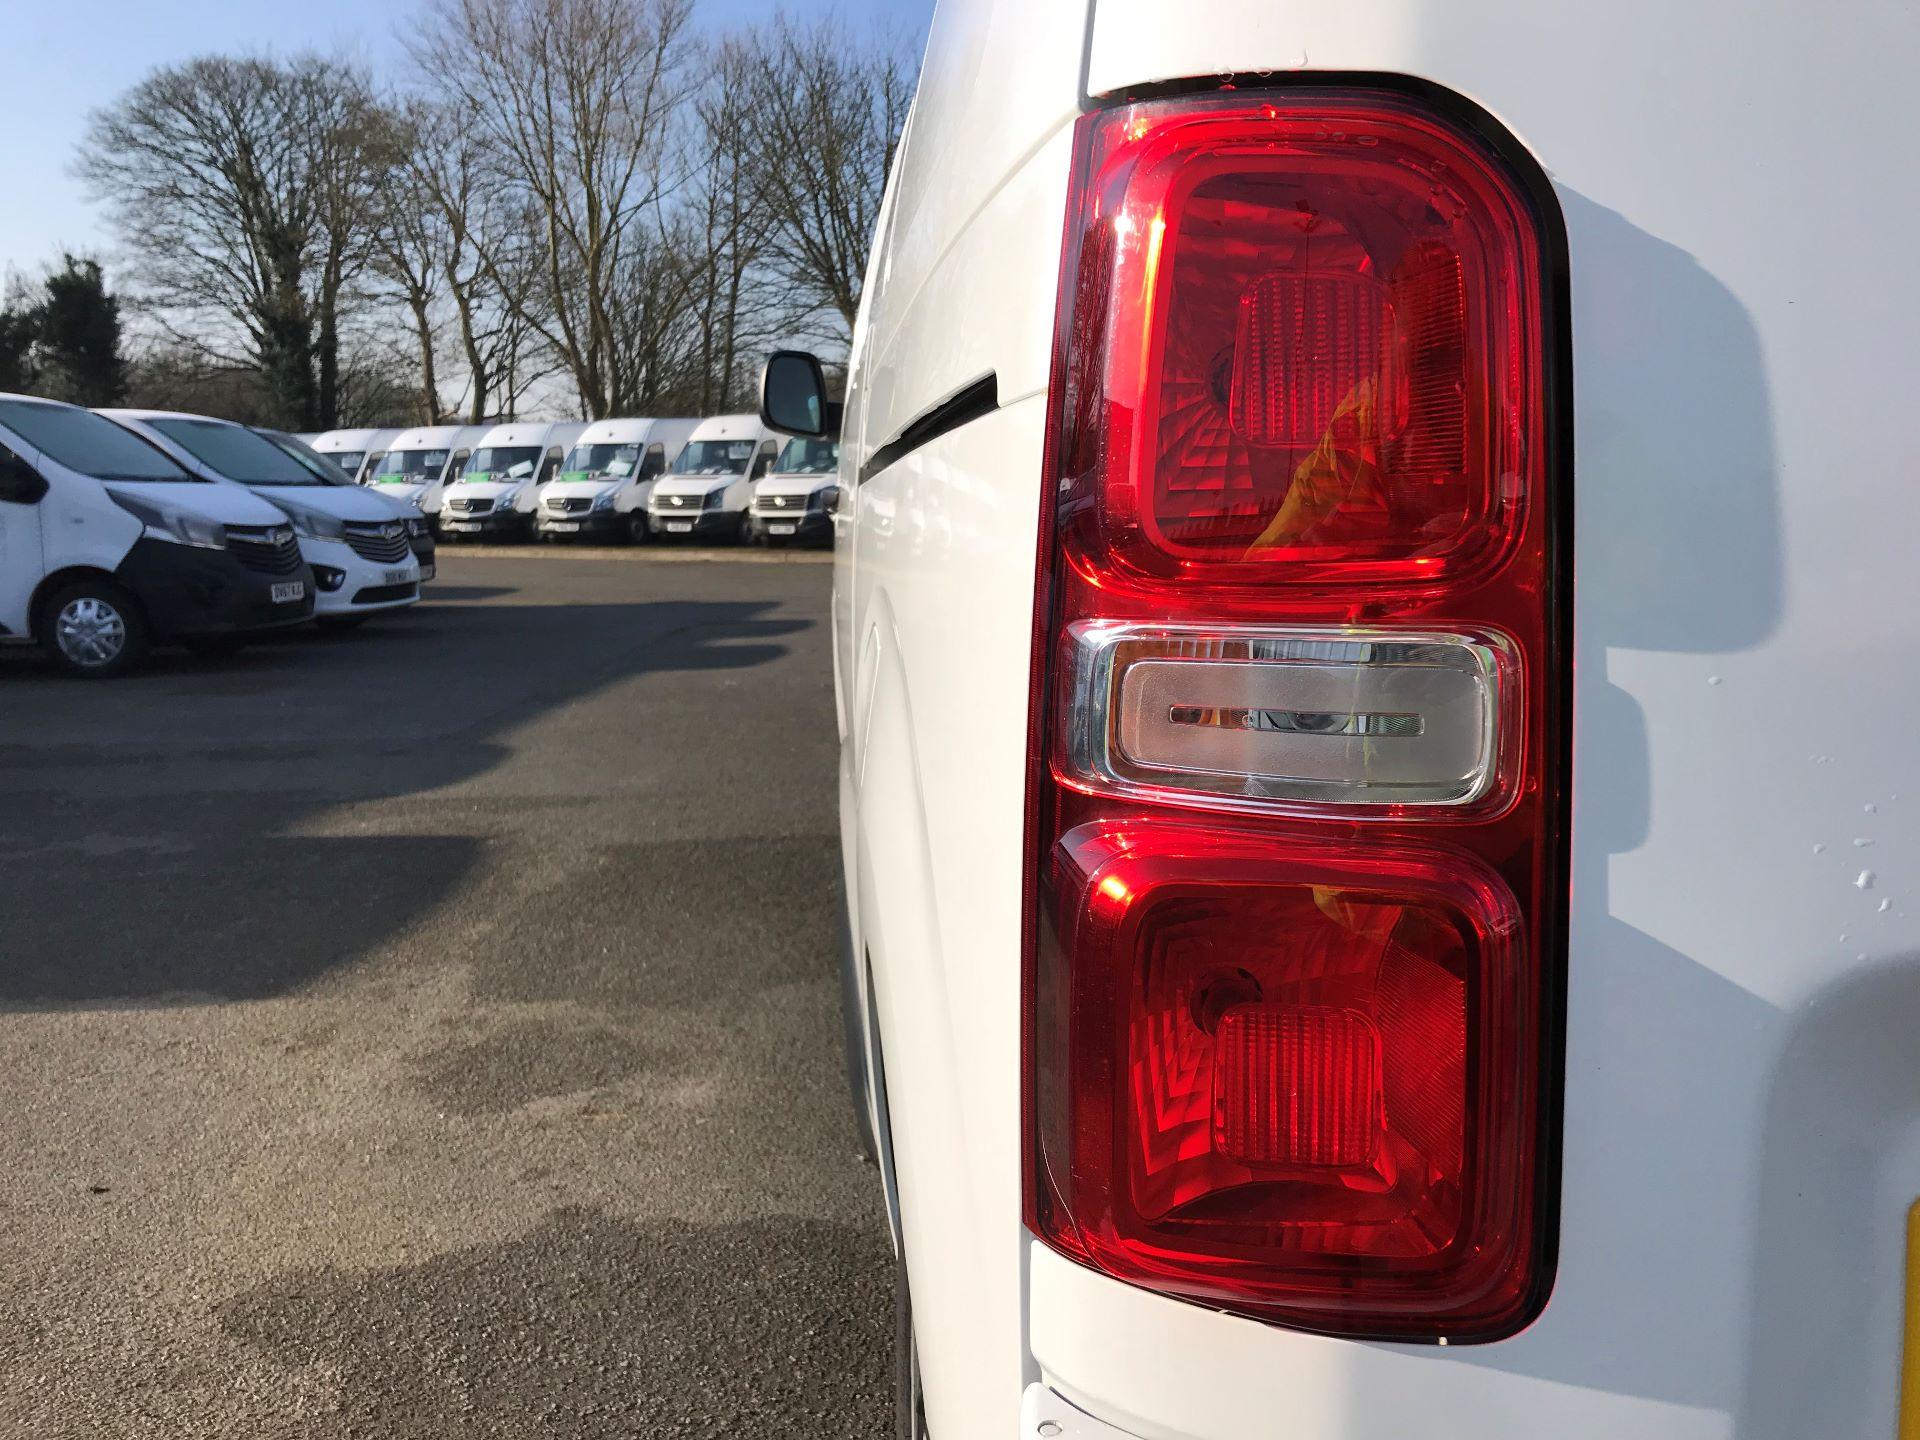 2018 Peugeot Expert STANDARD 1000 1.6 BLUEHDI 95 PROFESSIONAL EURO 6 (NU18MVC) Image 14